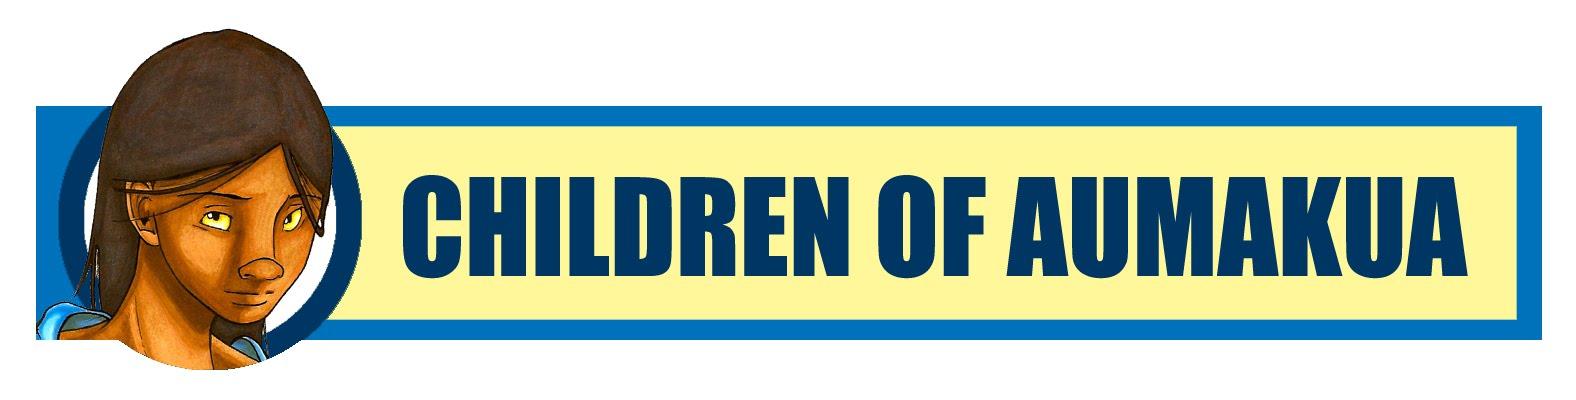 http://childrenofaumakua.thecomicseries.com